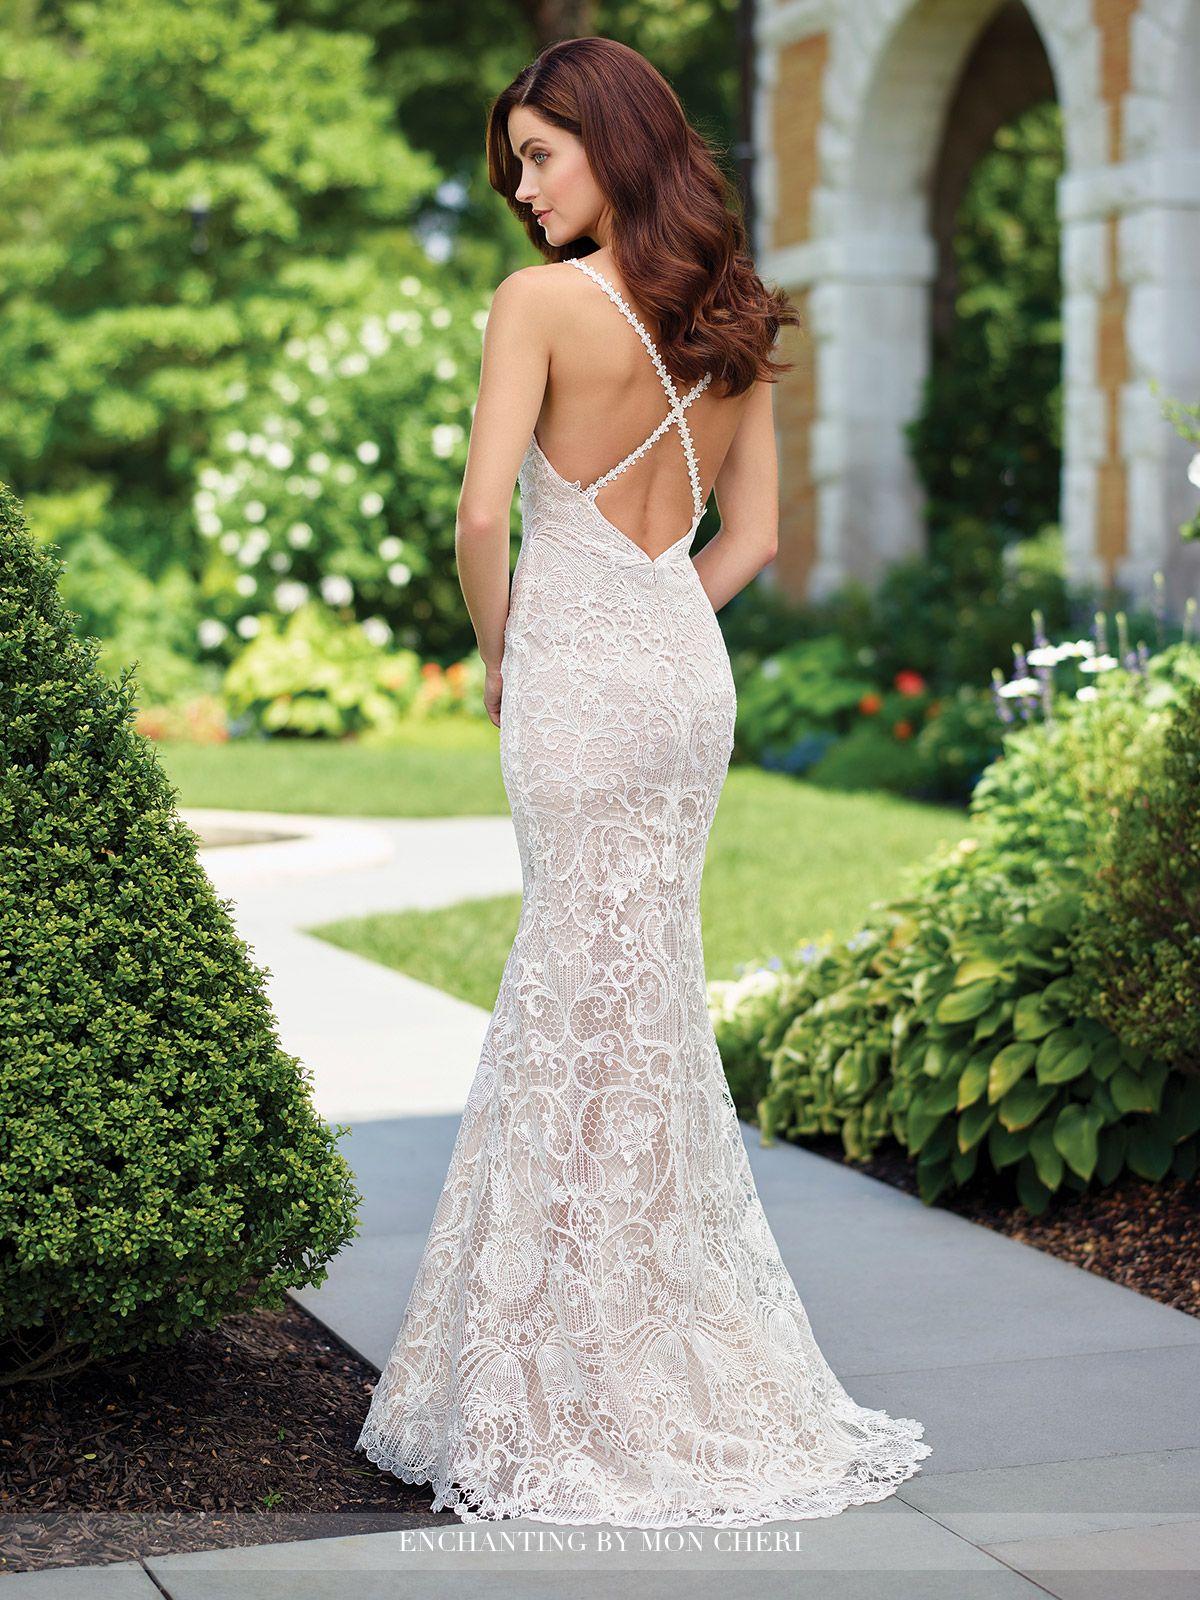 Beaded Chiffon Wedding Dress Enchanting by Mon Cheri